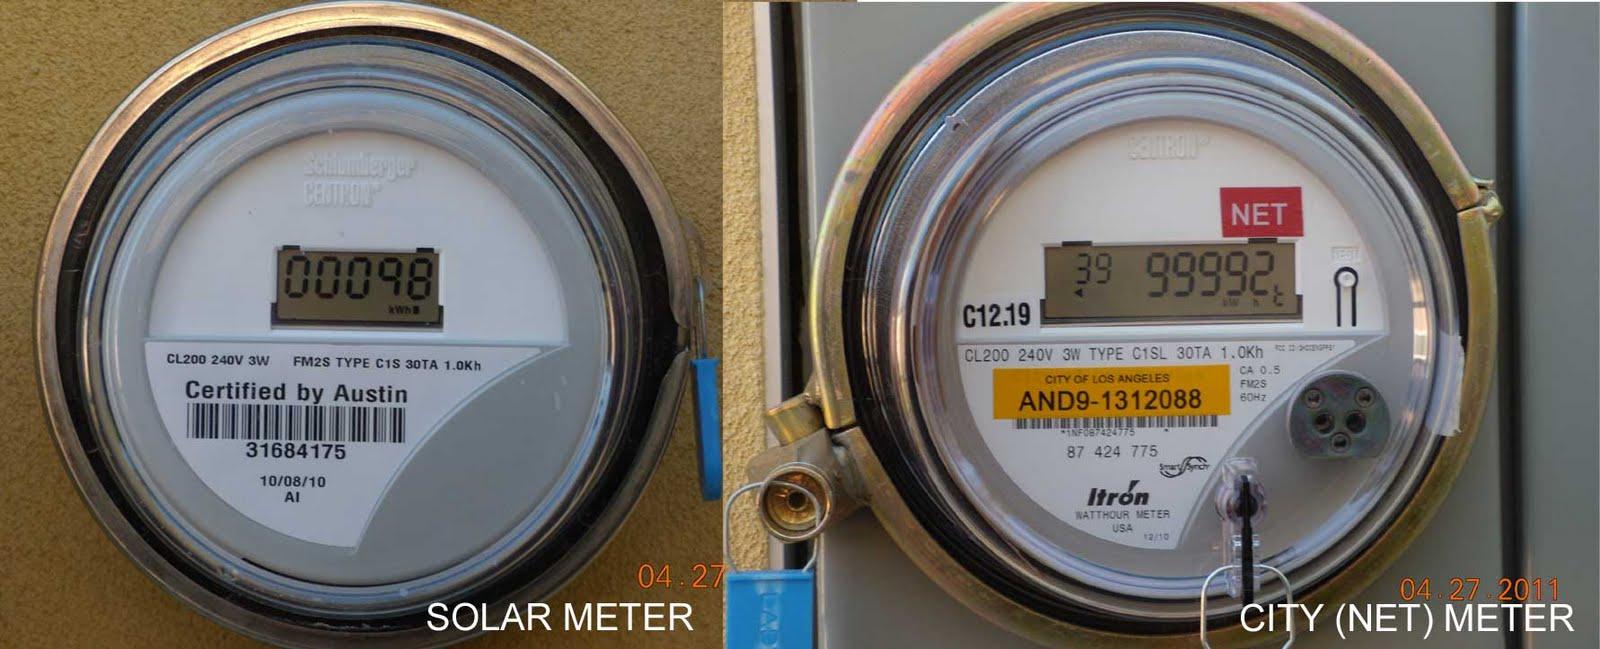 Net Meter Reading : Nobhillhaus net metering